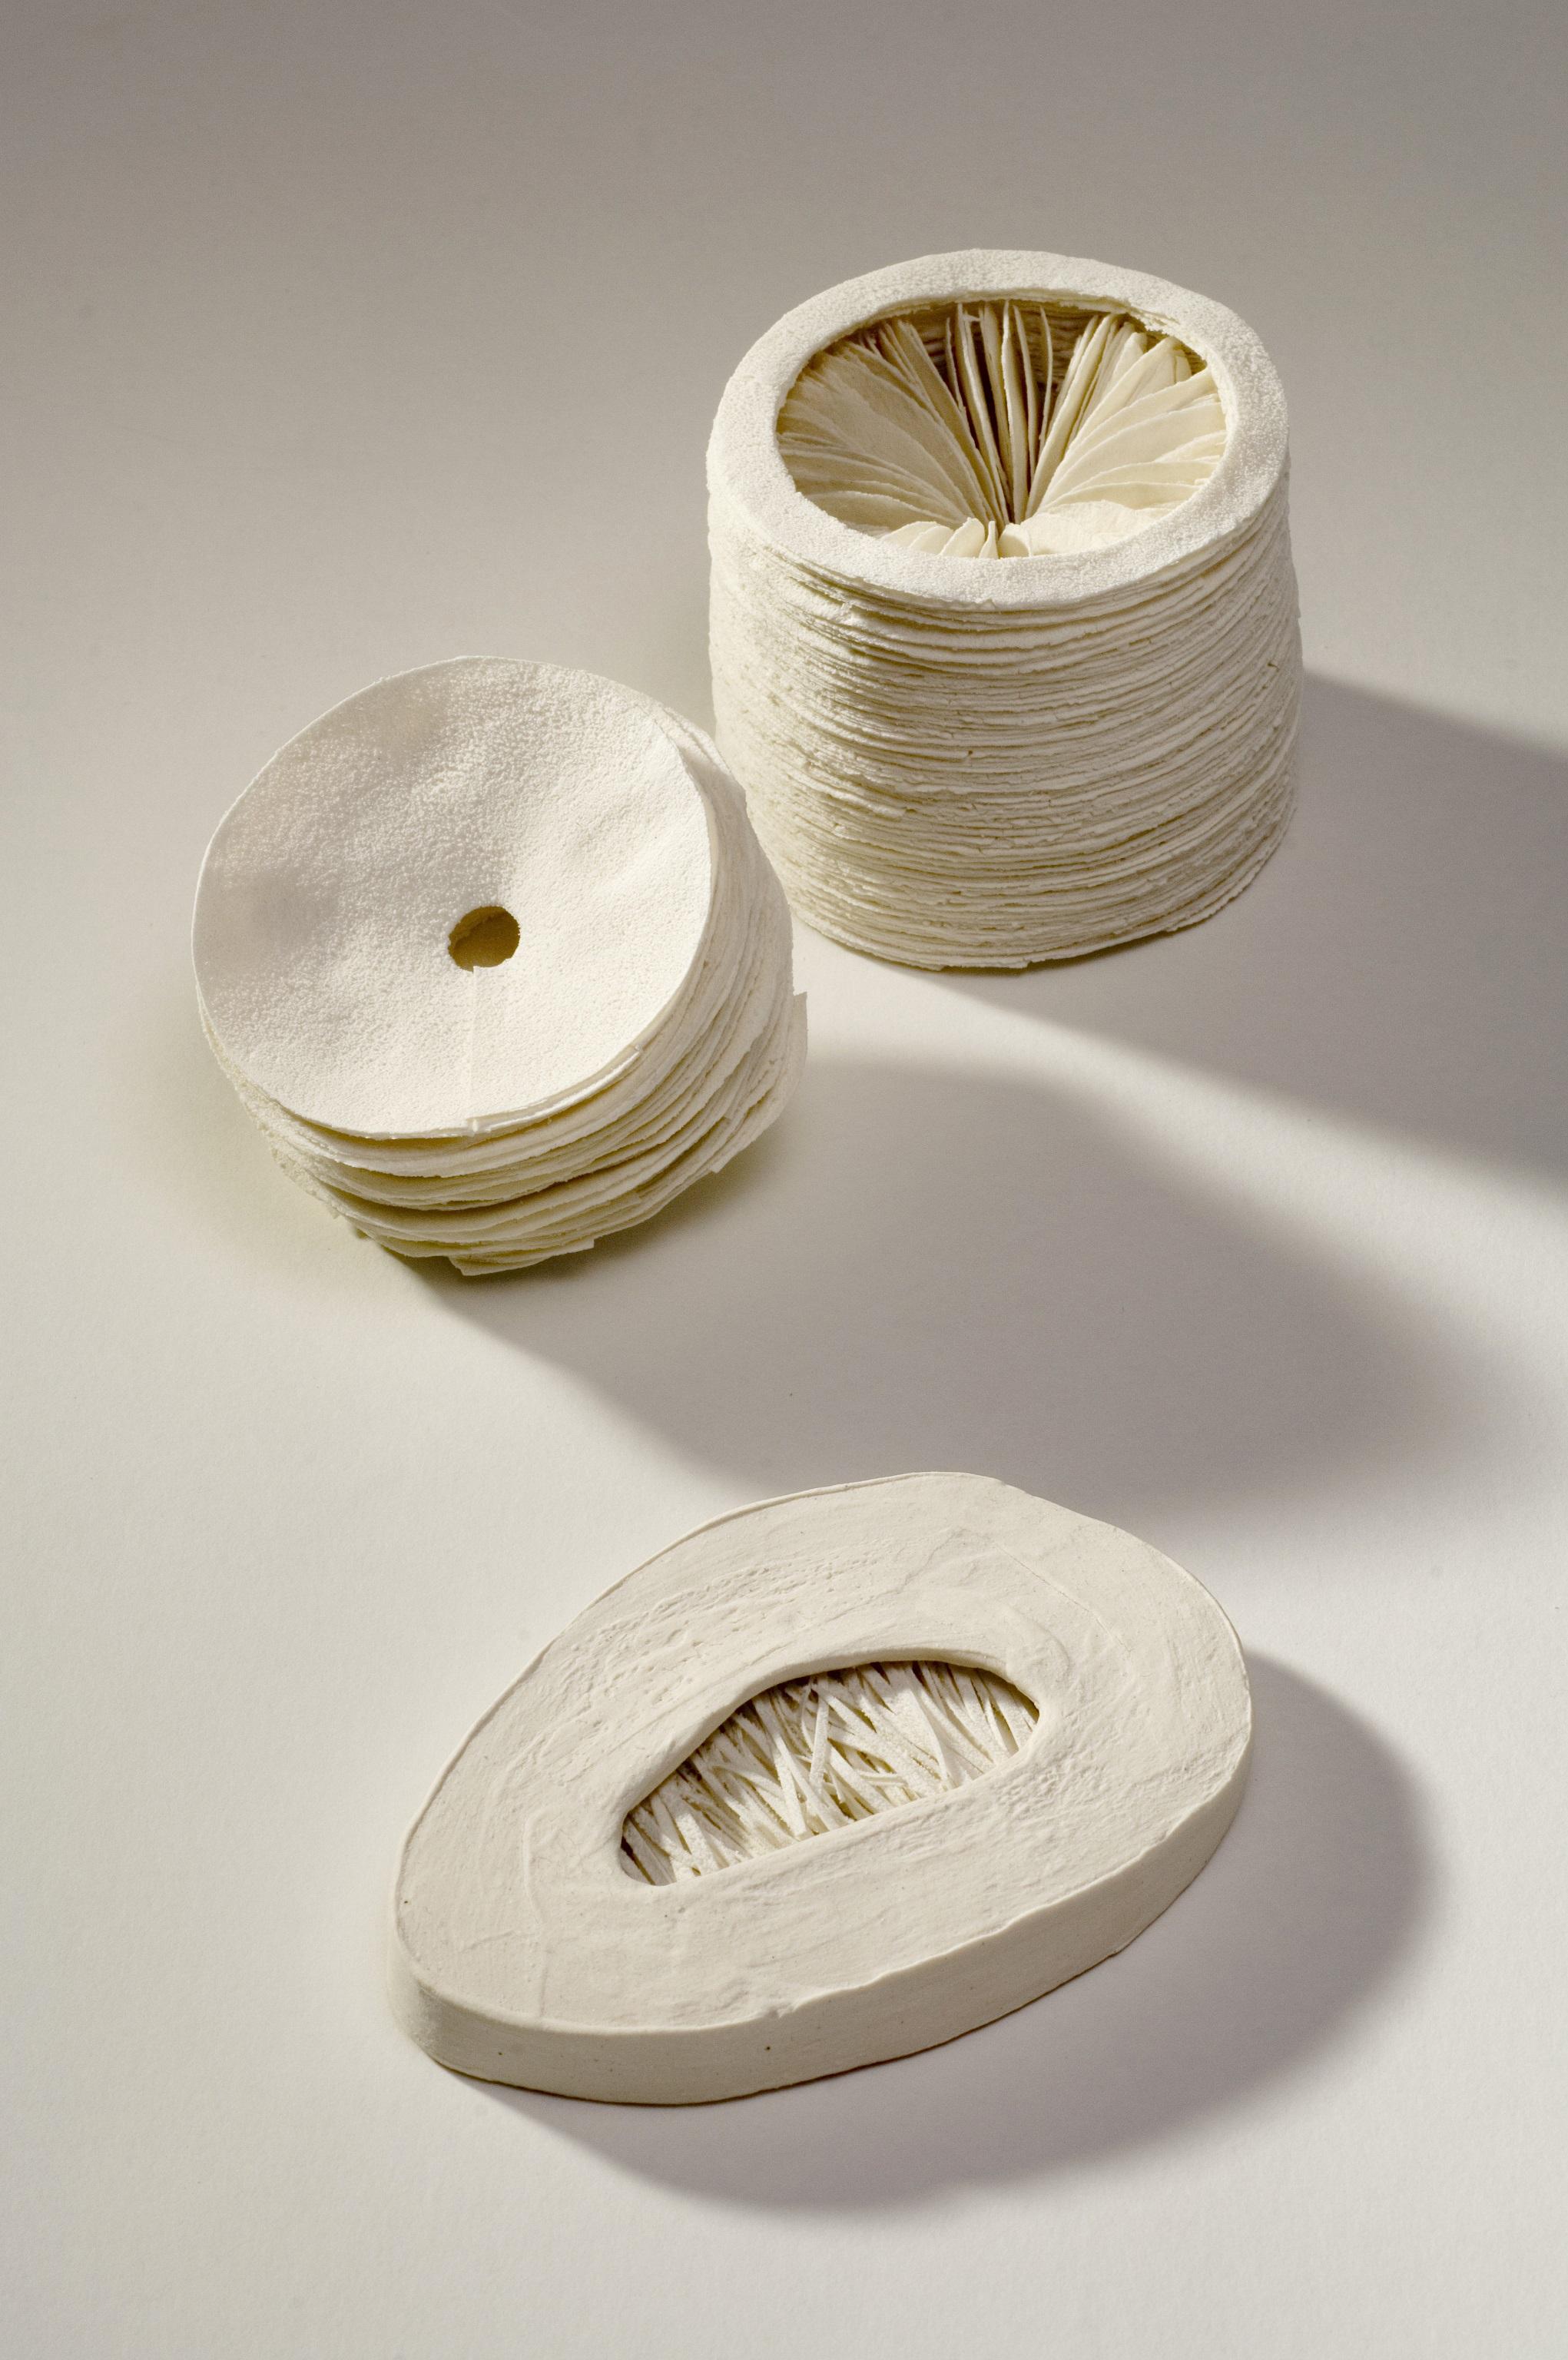 Interior Series (3 parts),  2006, artist blend glaze material, stoneware, 9cm x 18cm x 30cm (grouping)